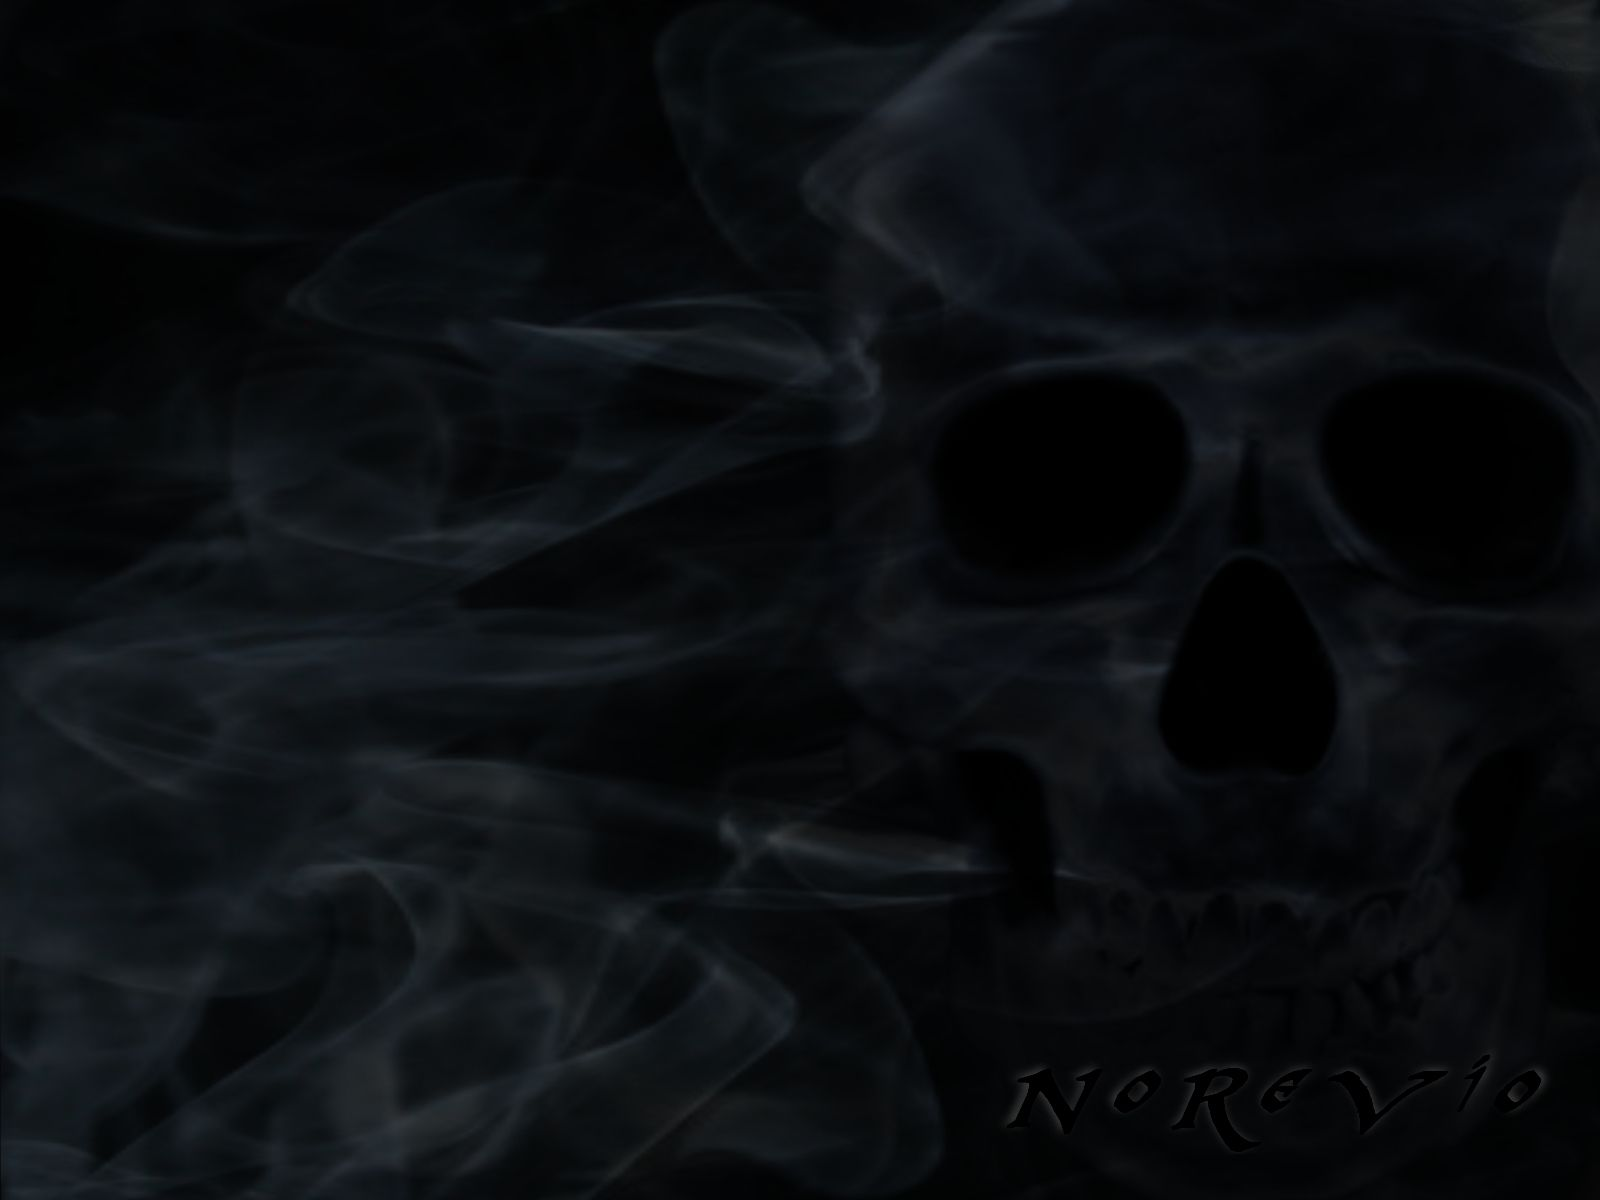 3d Tattoo Wallpaper Desktop Smoking Skull Wallpapers Group 47